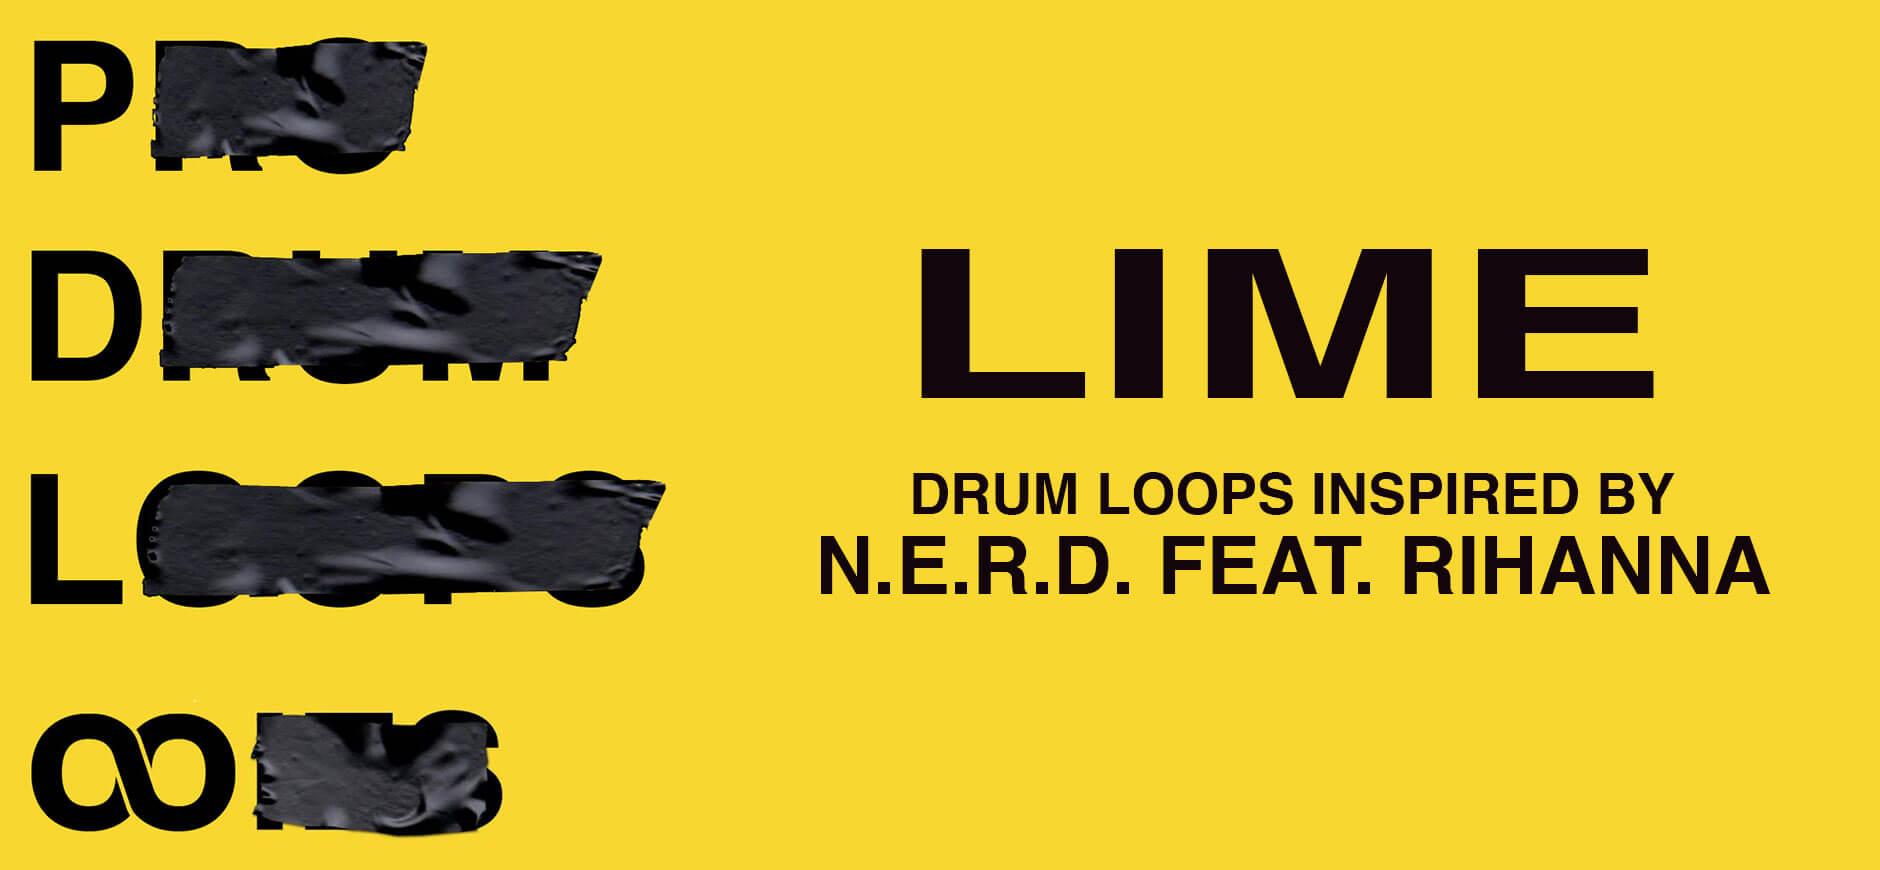 Lemon Drum Loops Inspired by NERD feat. Rihanna